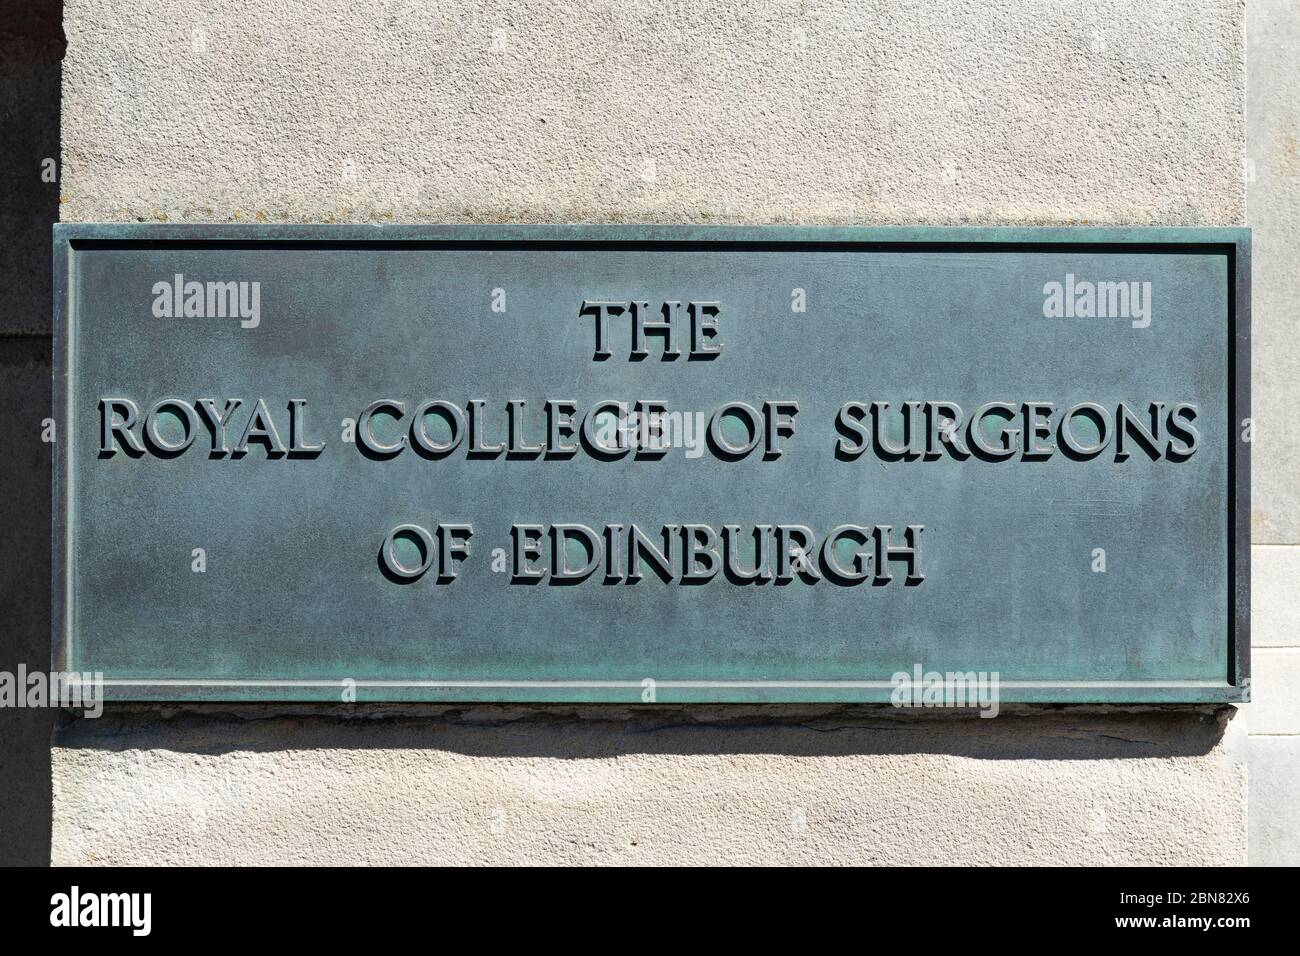 Name plate for The Royal College of Surgeons of Edinburgh displayed outside Surgeons' Hall Museums on Nicholson Street Edinburgh, Scotland, UK Stock Photo